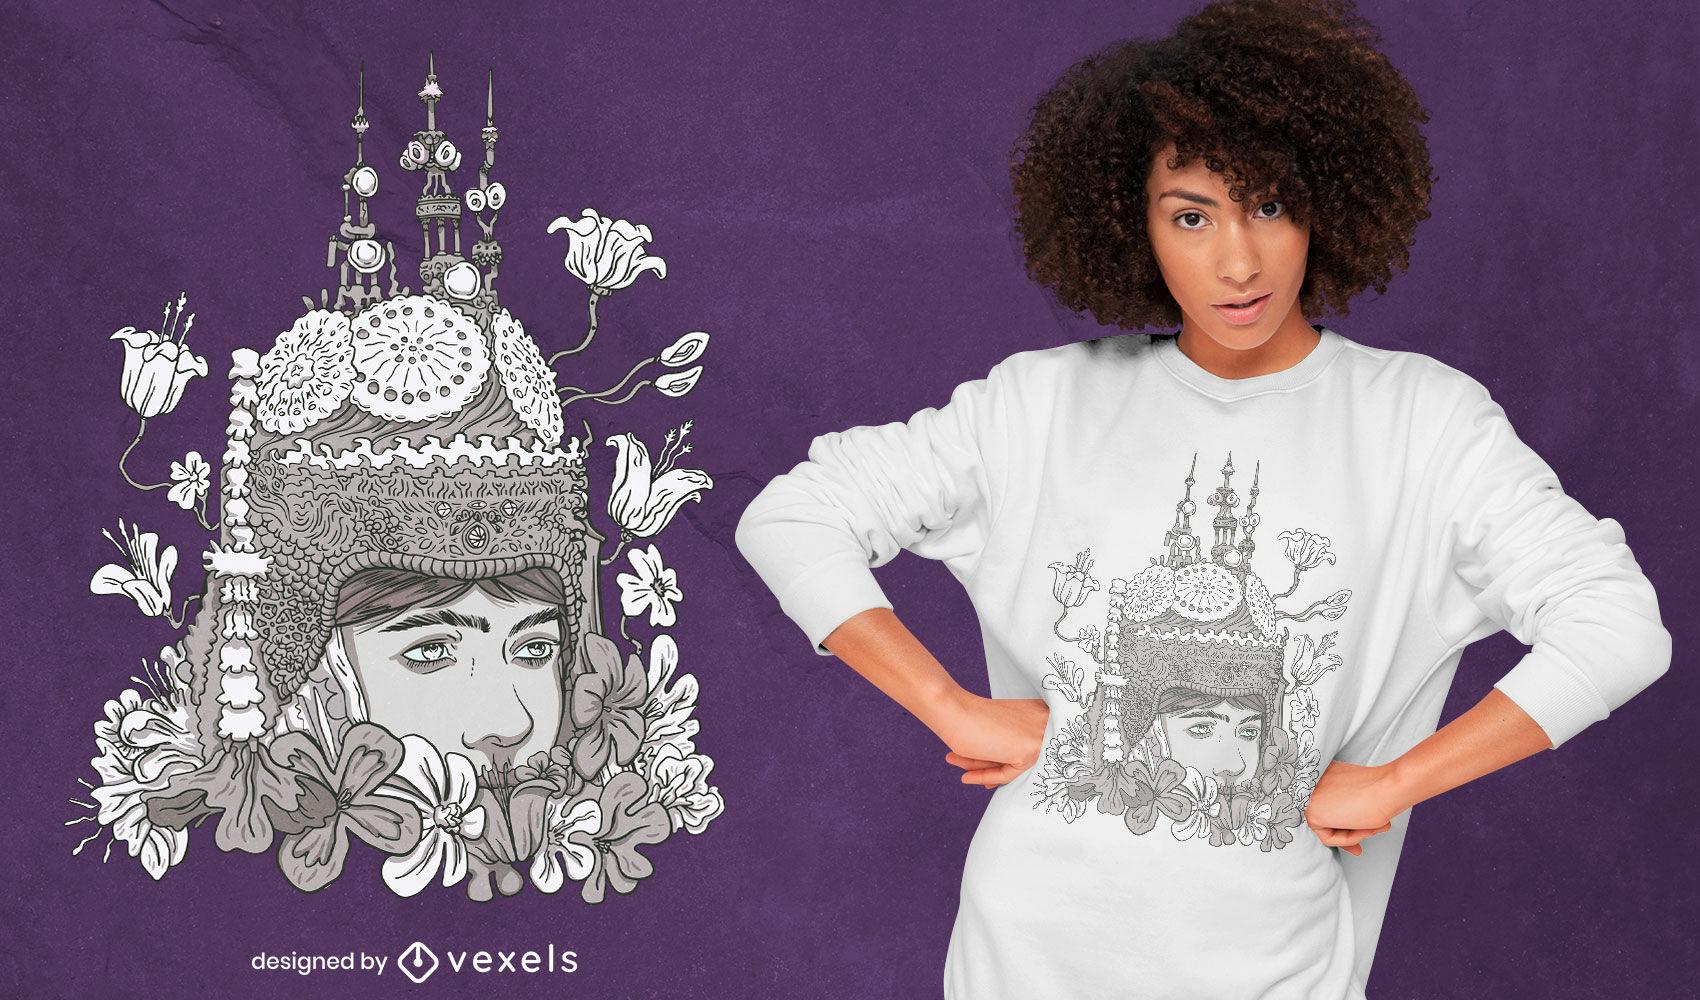 Diseño de camiseta de cultura espiritual hindú apsara.